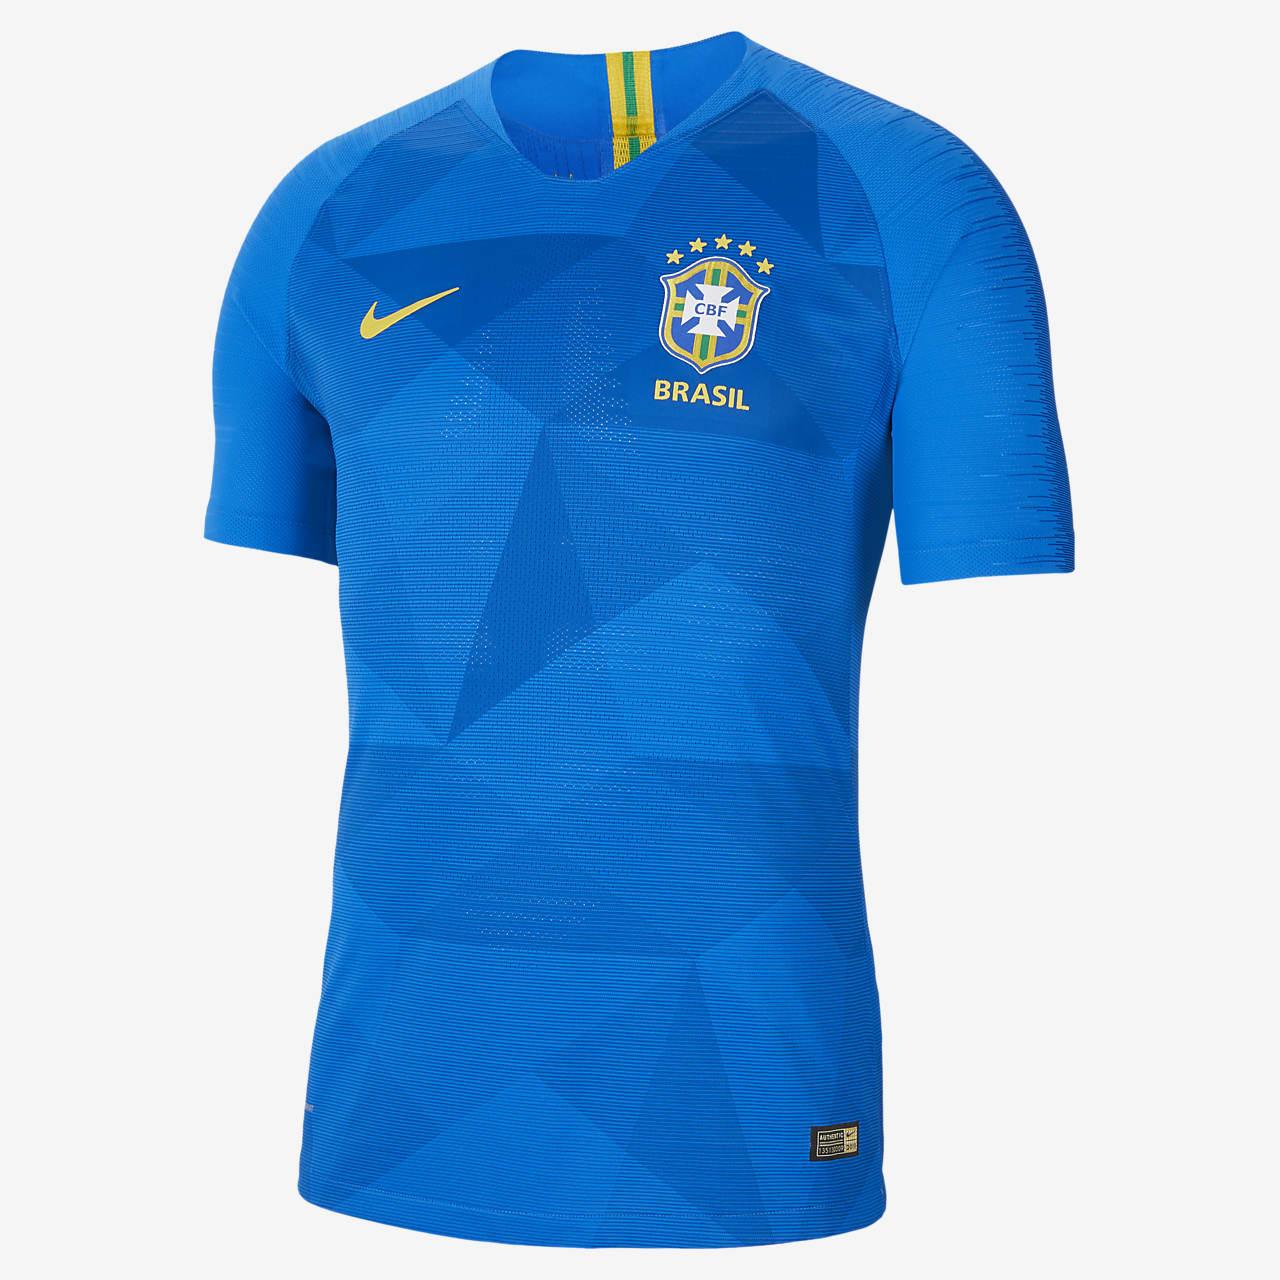 3c2cec8c5 2018 Brazil CBF Vapor Match Away Men s Football Shirt. Nike.com CA